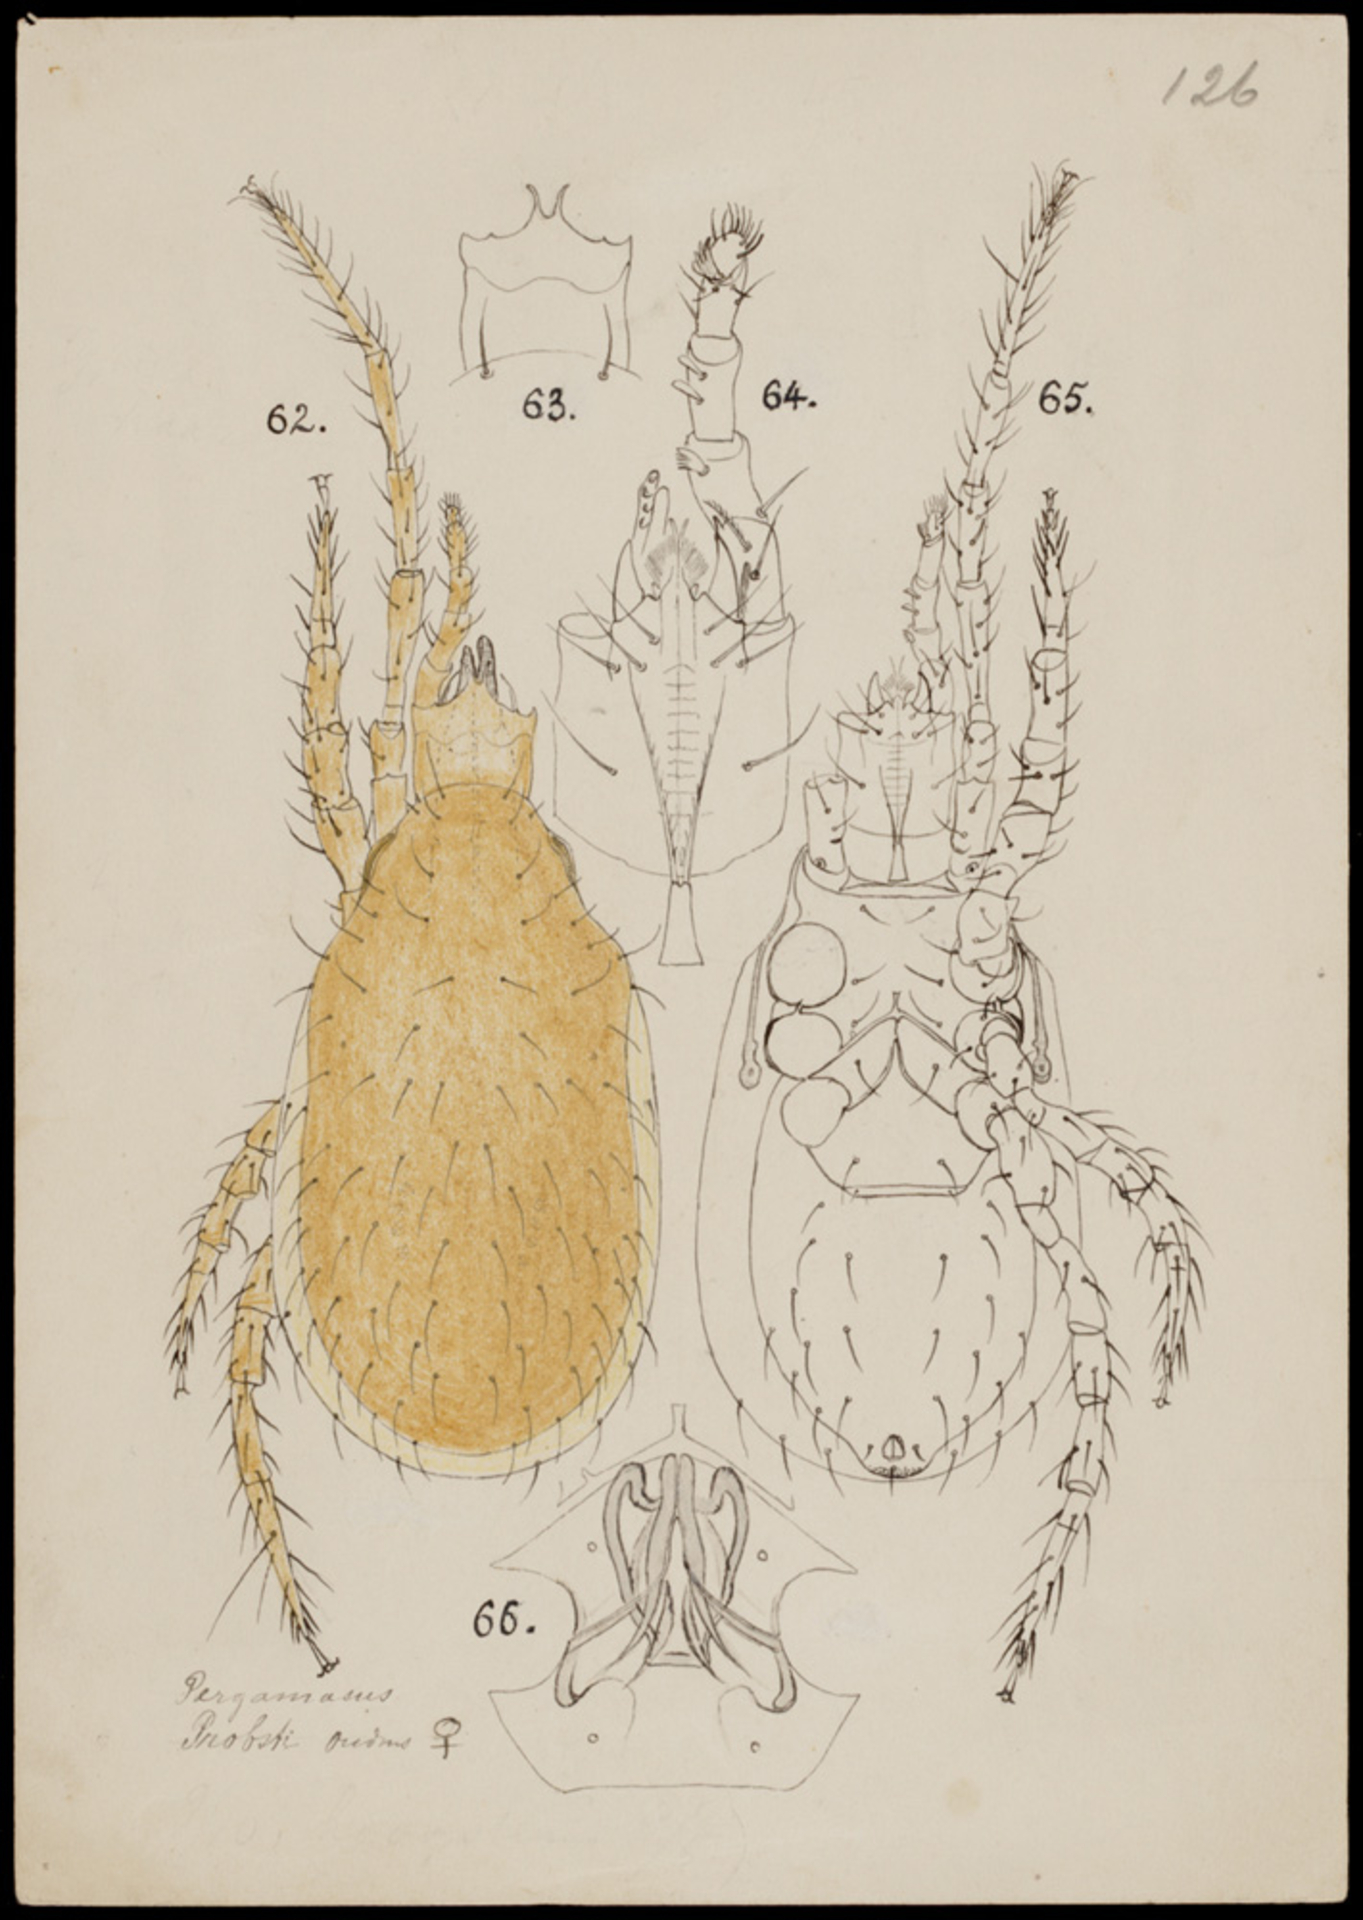 RMNH.ART.1002   Pergamasus probsti (Oudemans)